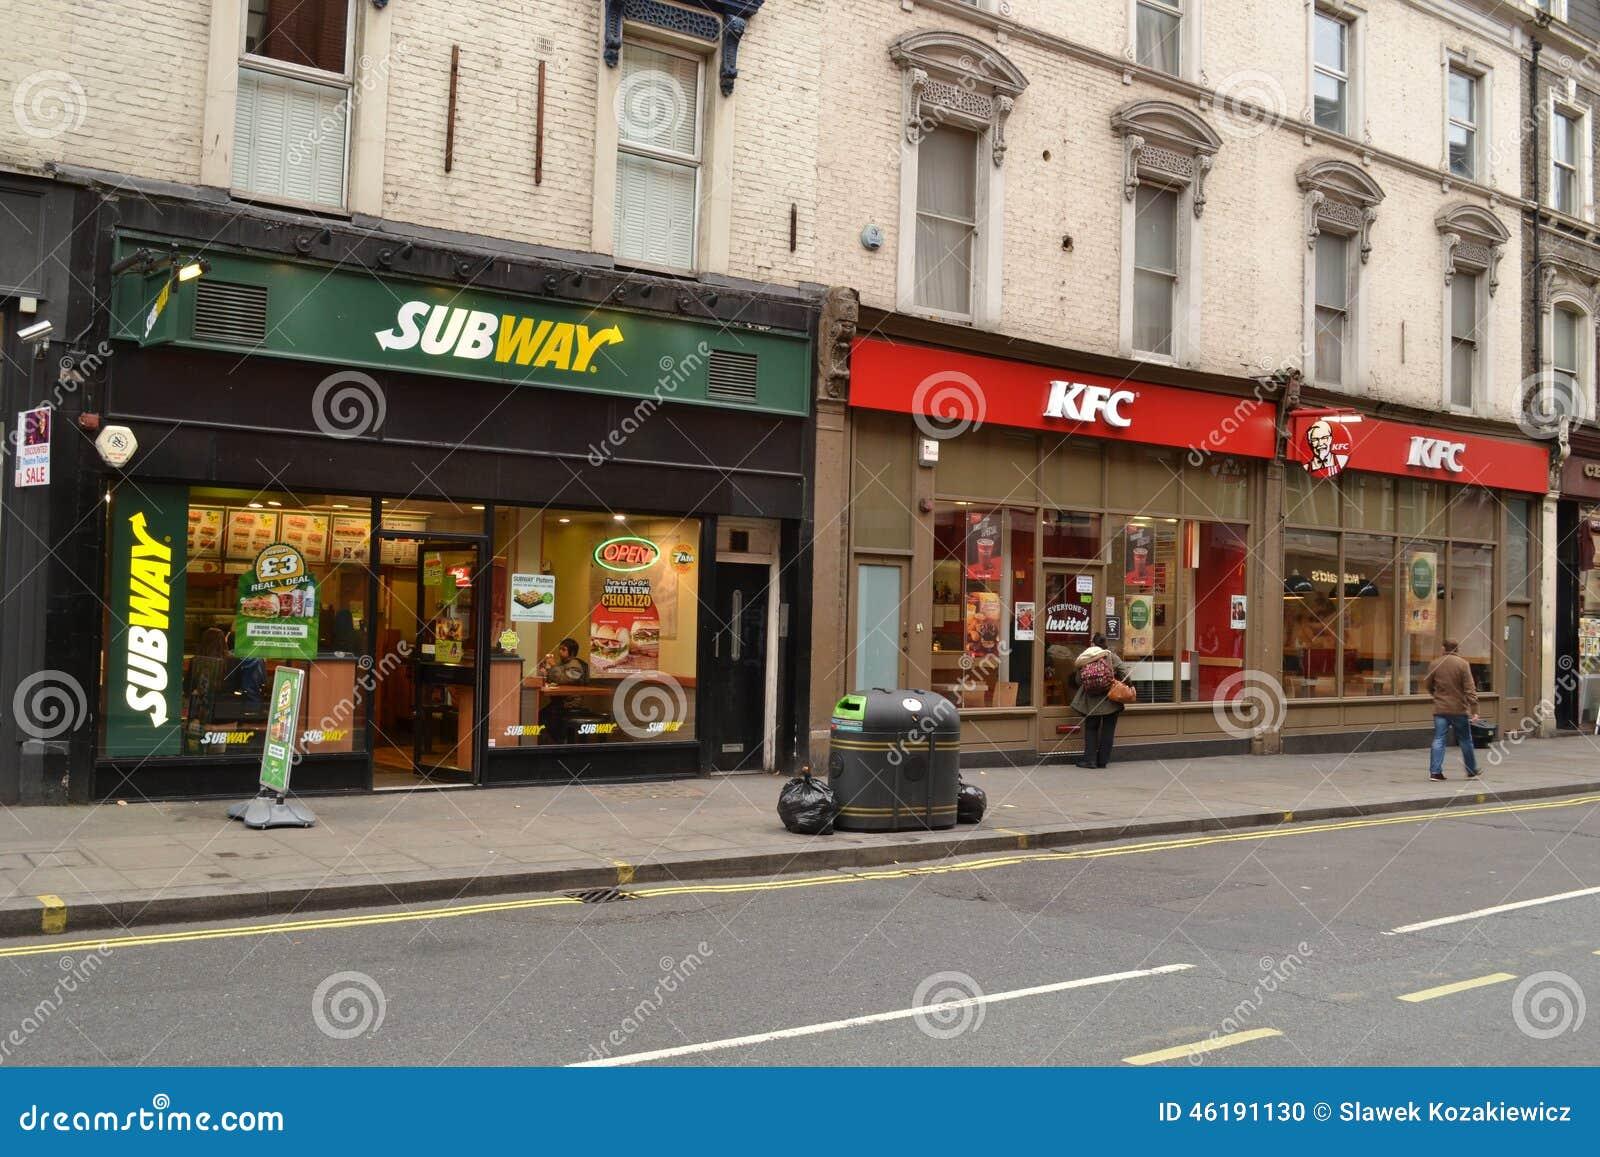 subway and kfc fast food restaurants editorial image image of sandwich restaurants 46191130. Black Bedroom Furniture Sets. Home Design Ideas